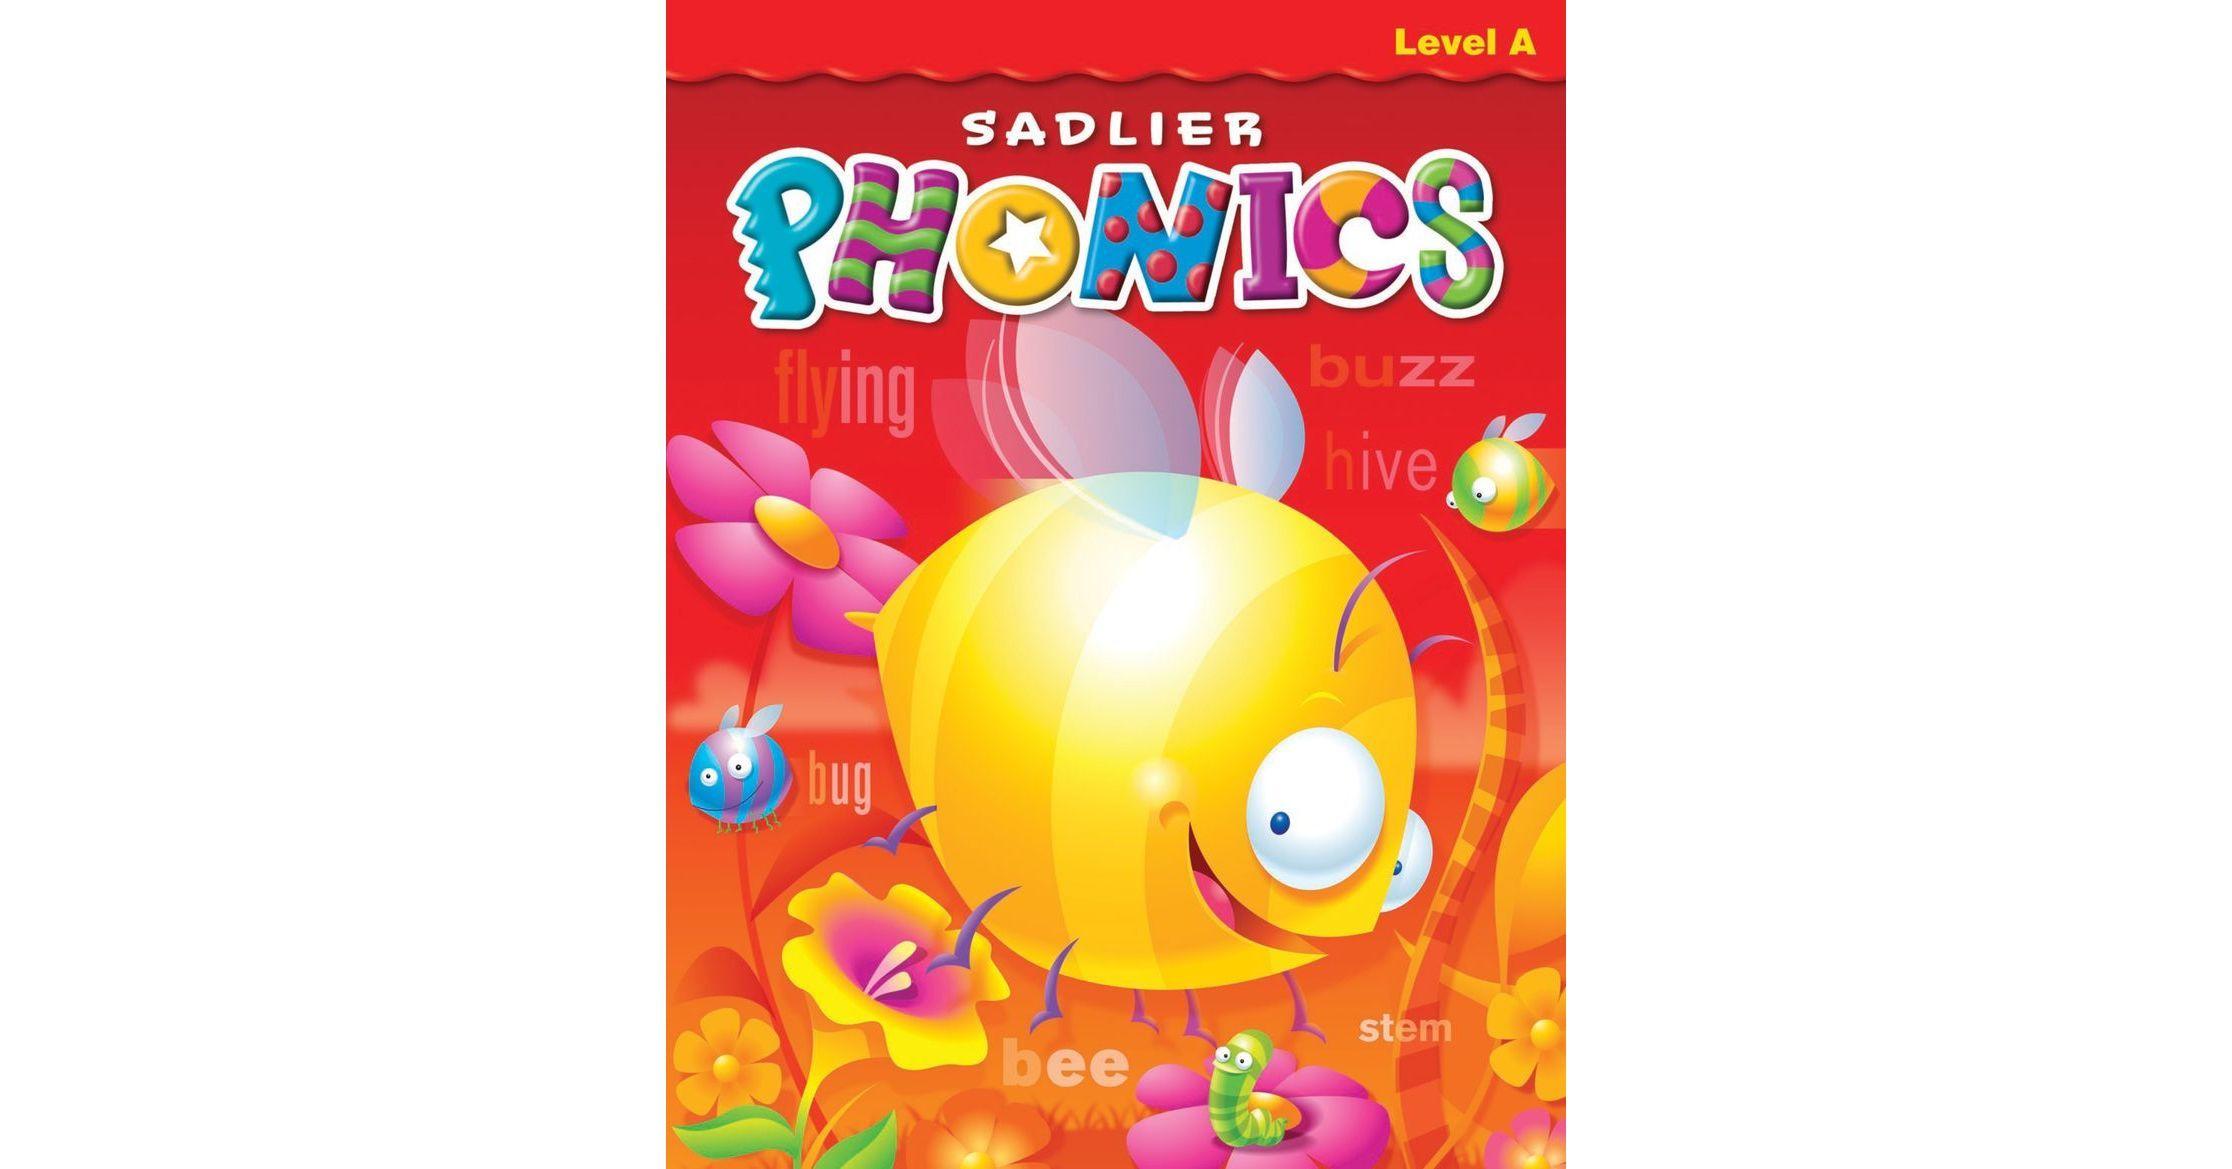 Sadlier Phonics Books